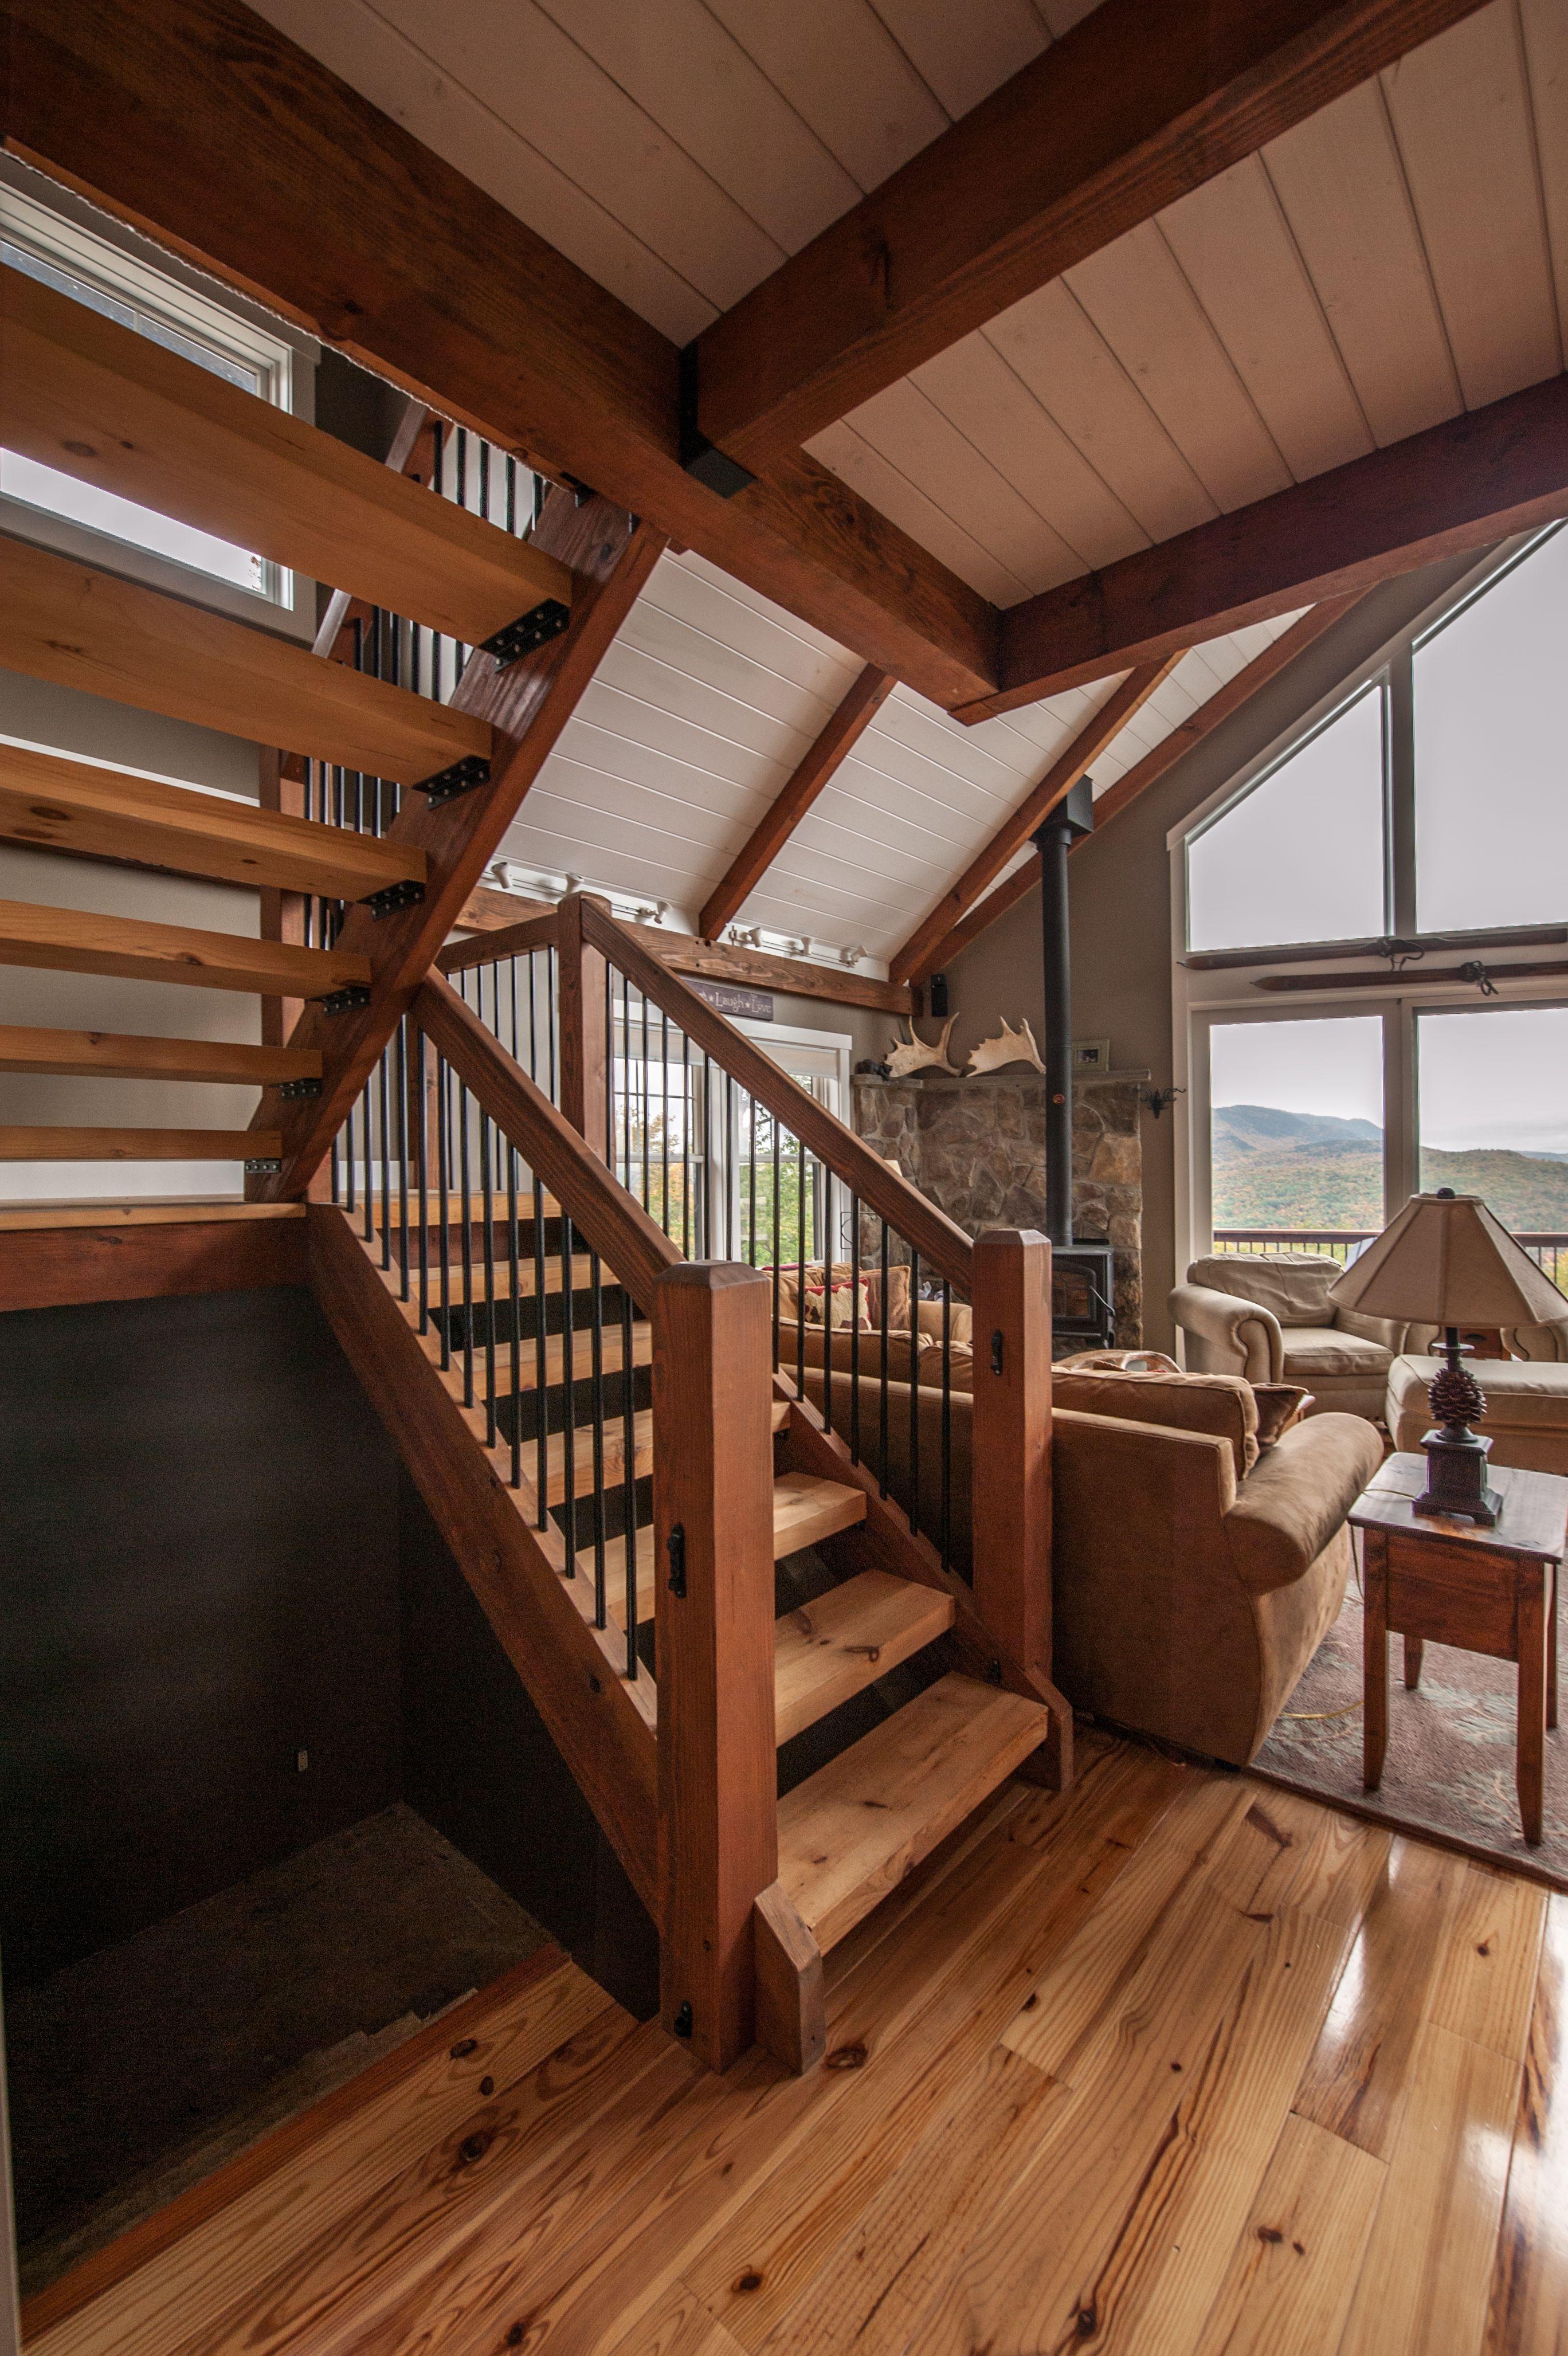 Moose Ridge Lodge Home Design Posts And Post And Beam - Post beam home designs